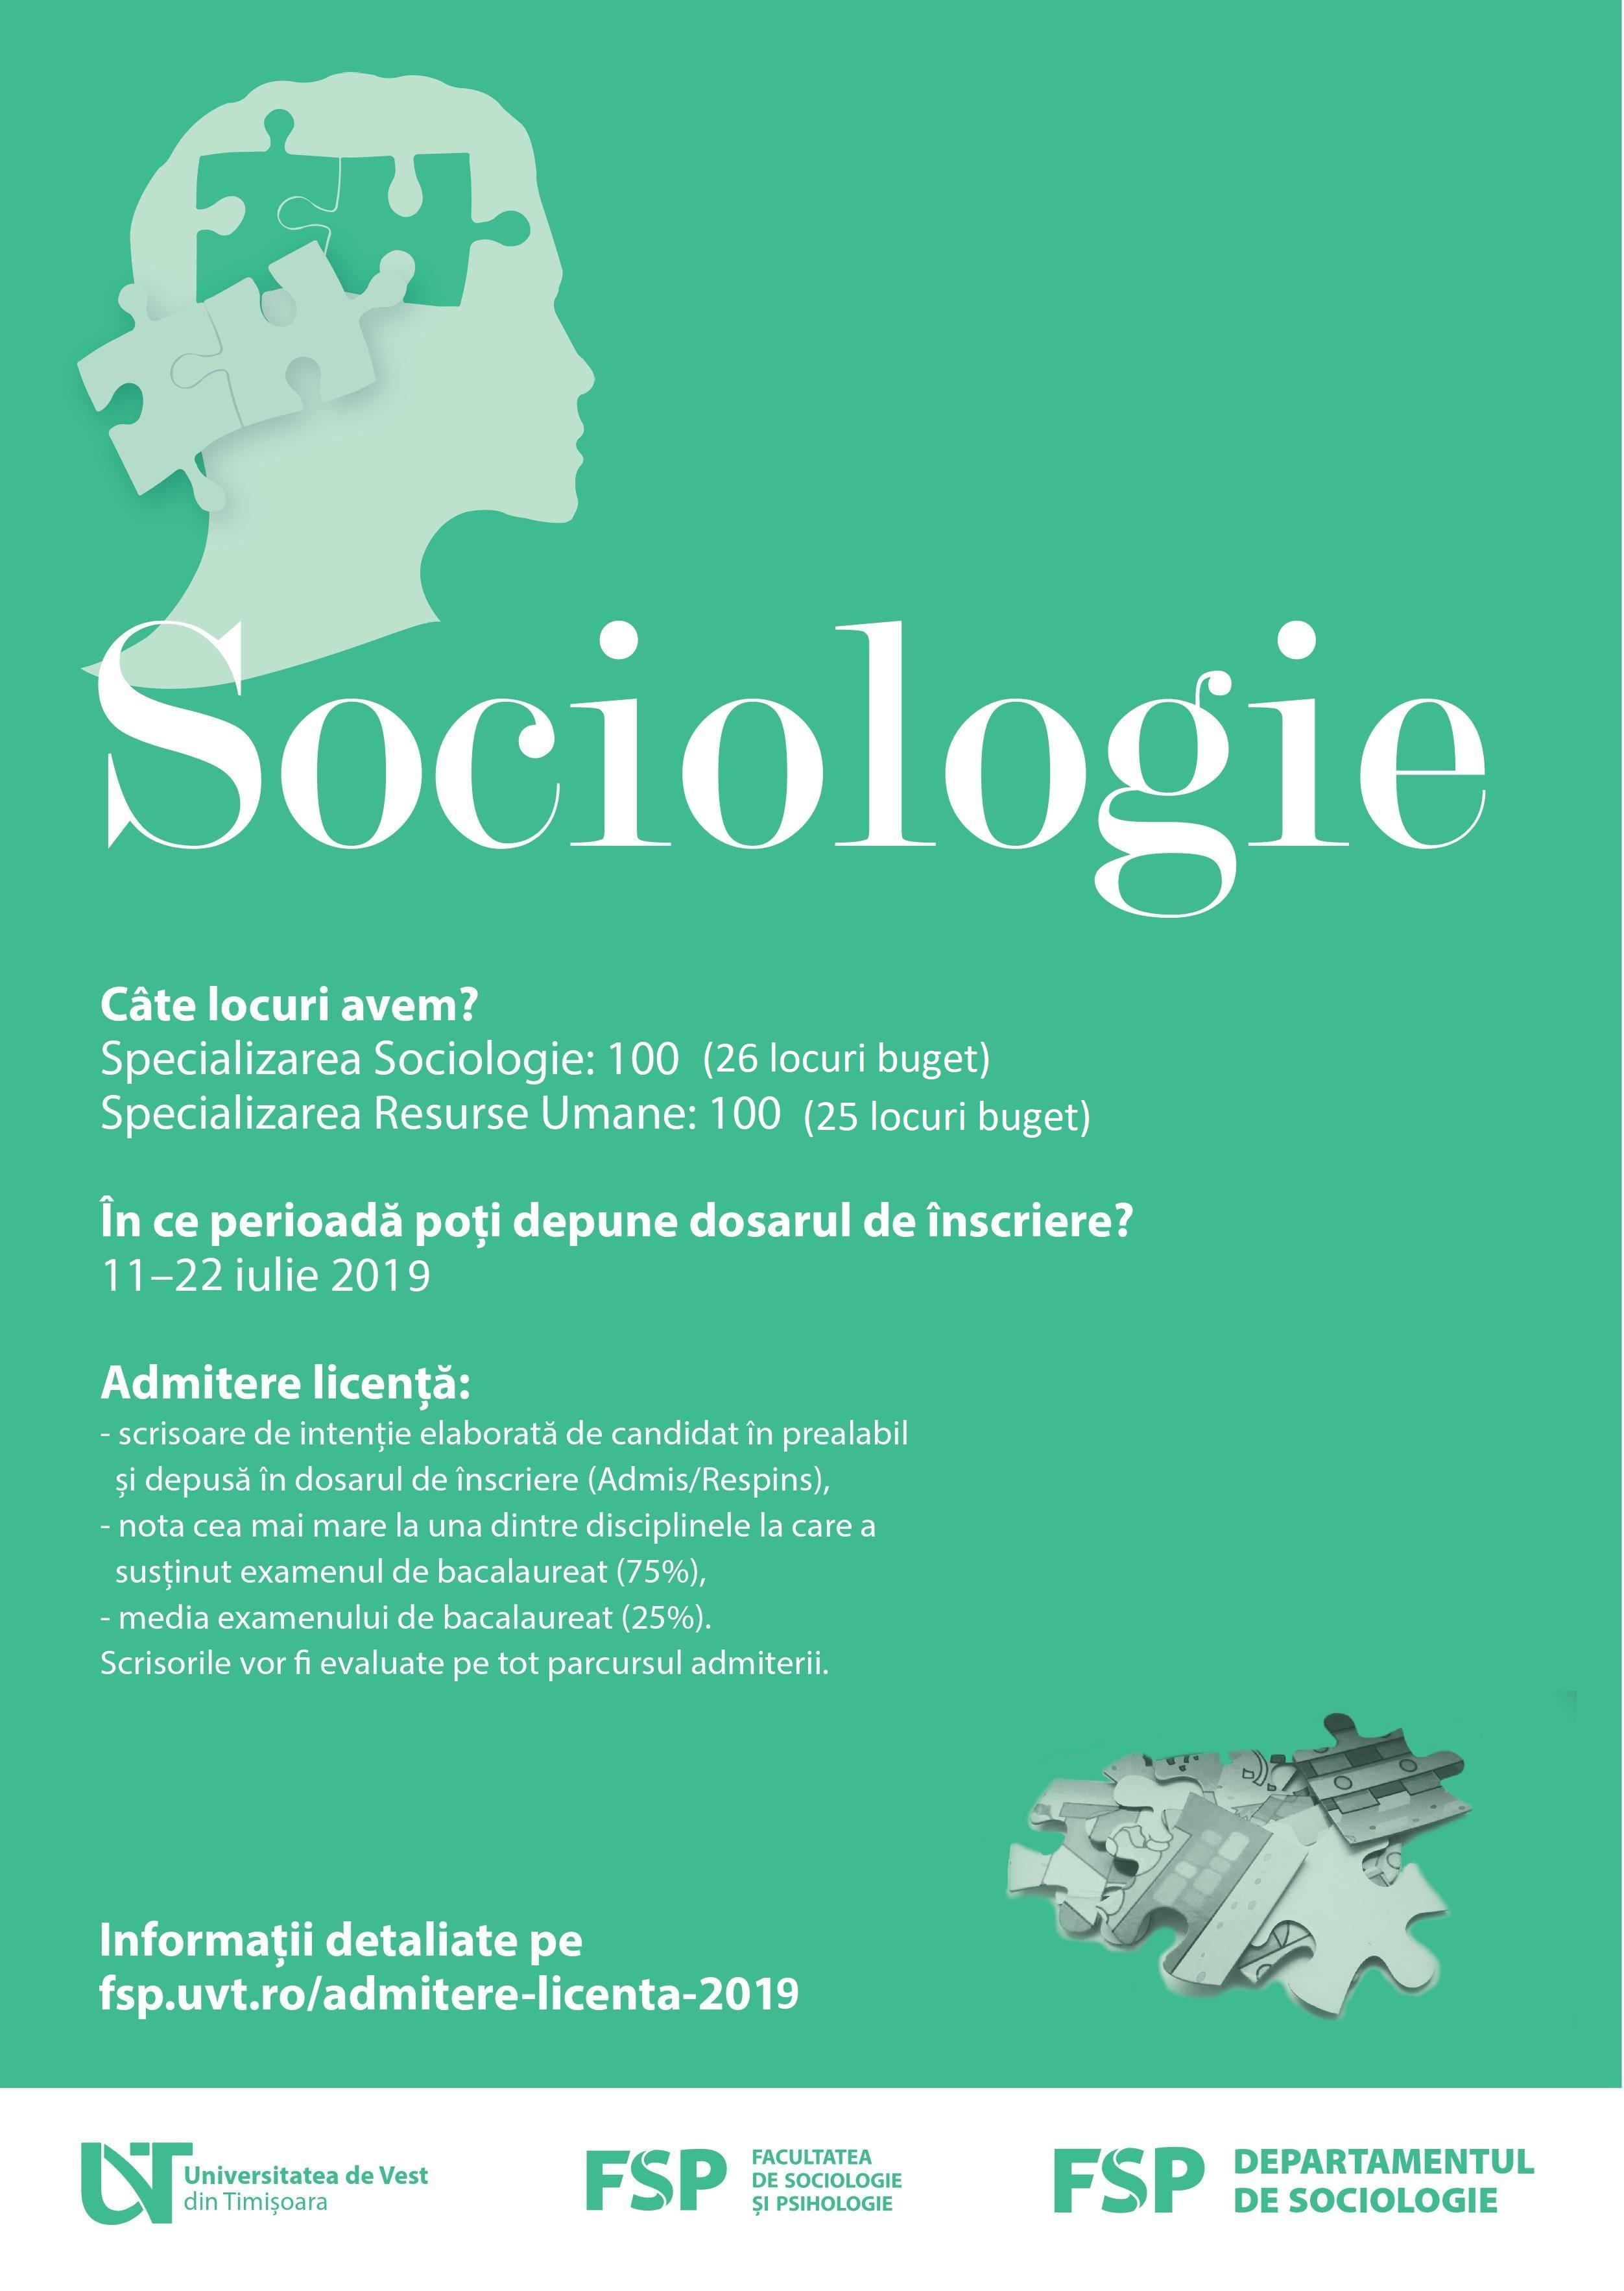 3.SOCIOLOGIE